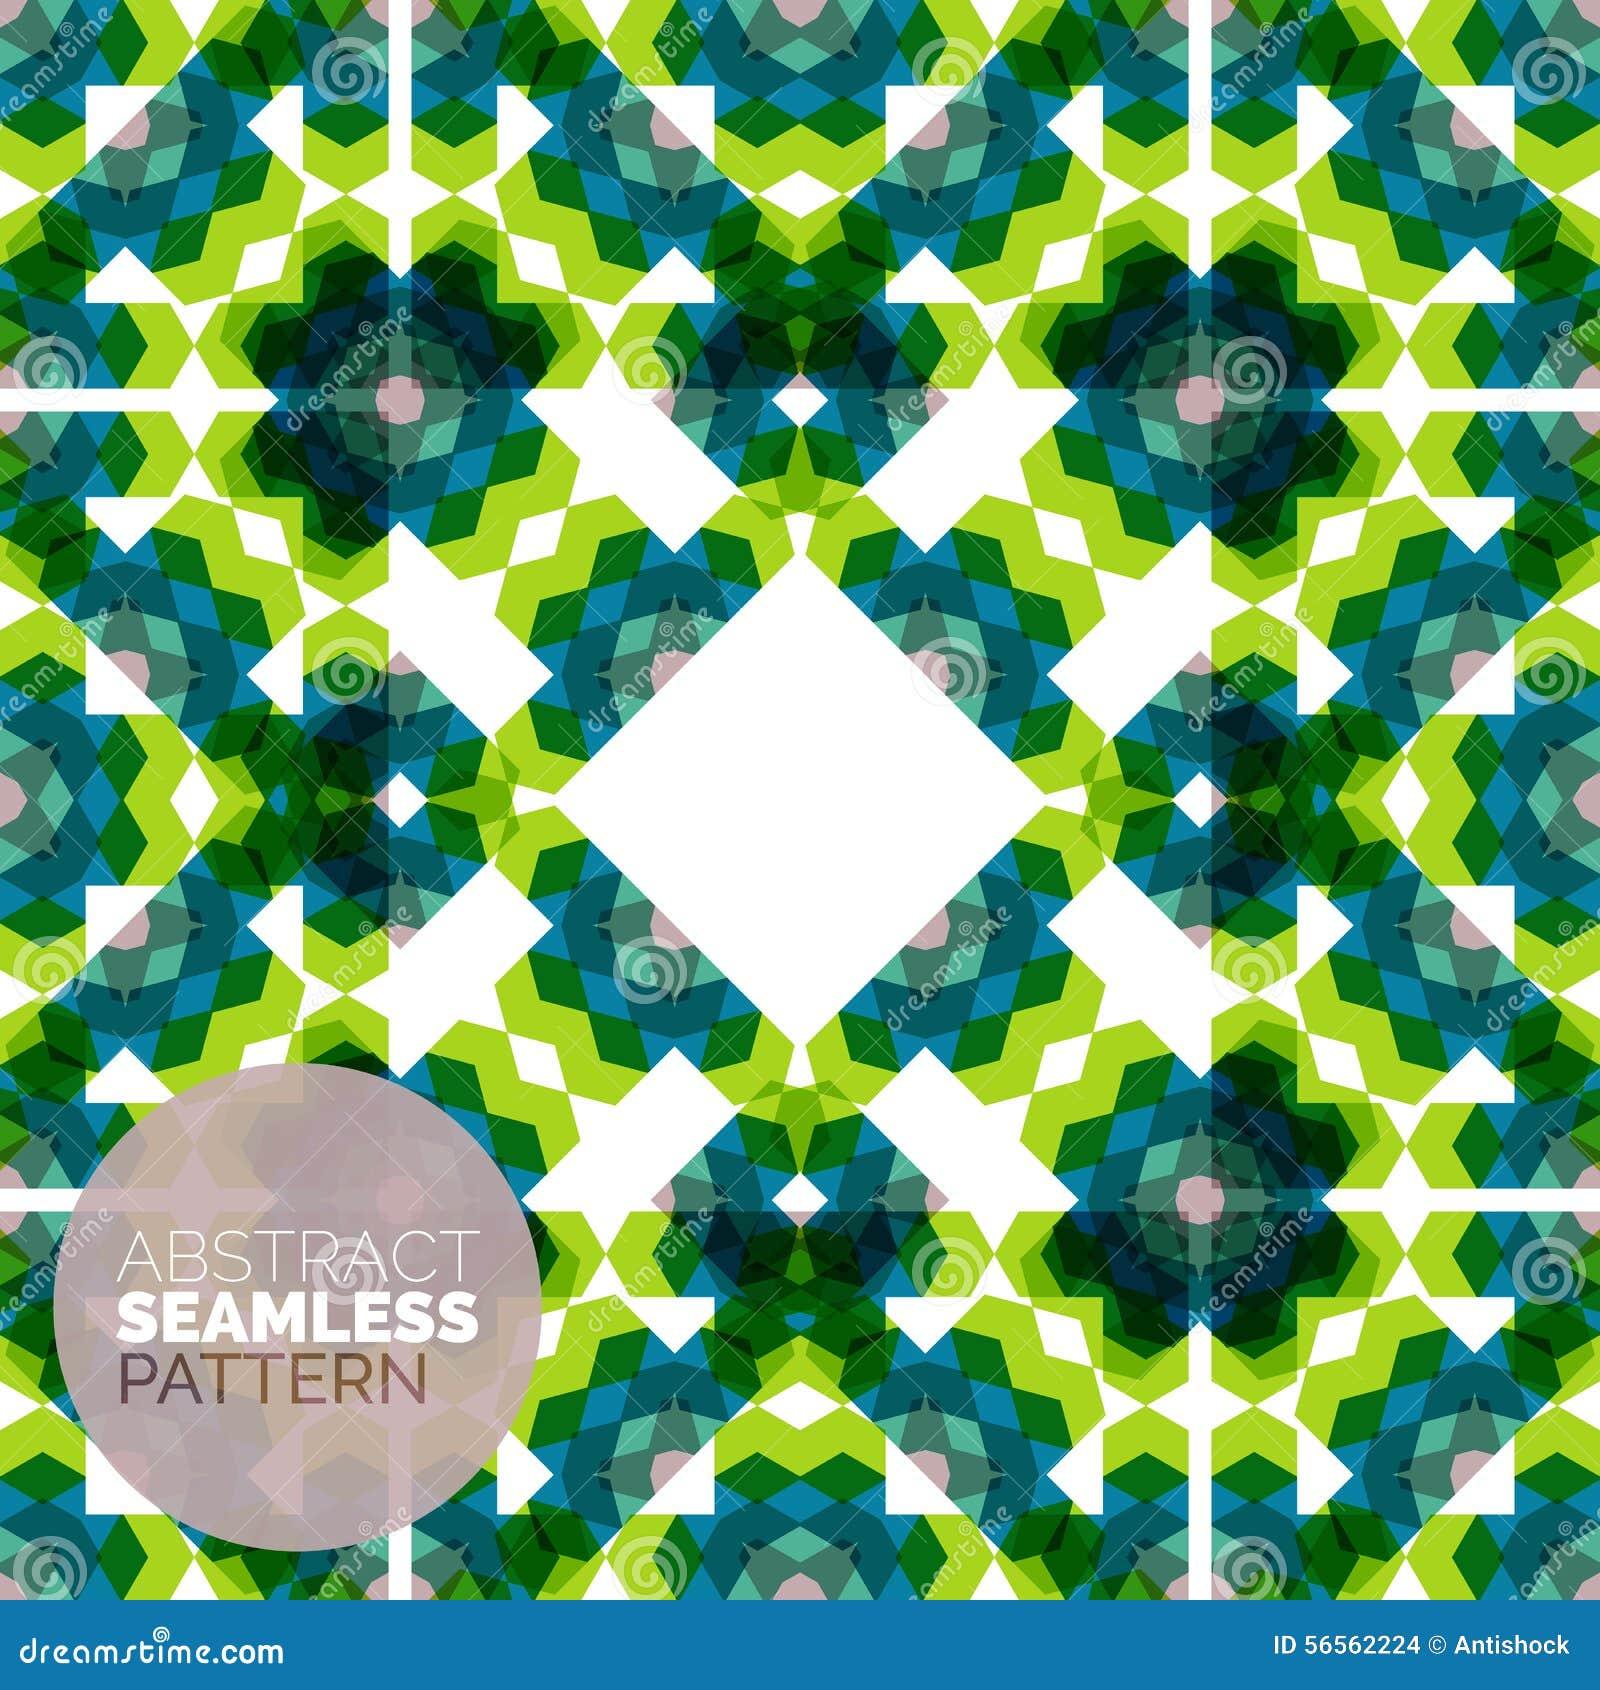 Download Διανυσματικό ζωηρόχρωμο άνευ ραφής γεωμετρικό σχέδιο σύγχρονος Διανυσματική απεικόνιση - εικονογραφία από ανασκόπησης, σχέδιο: 56562224